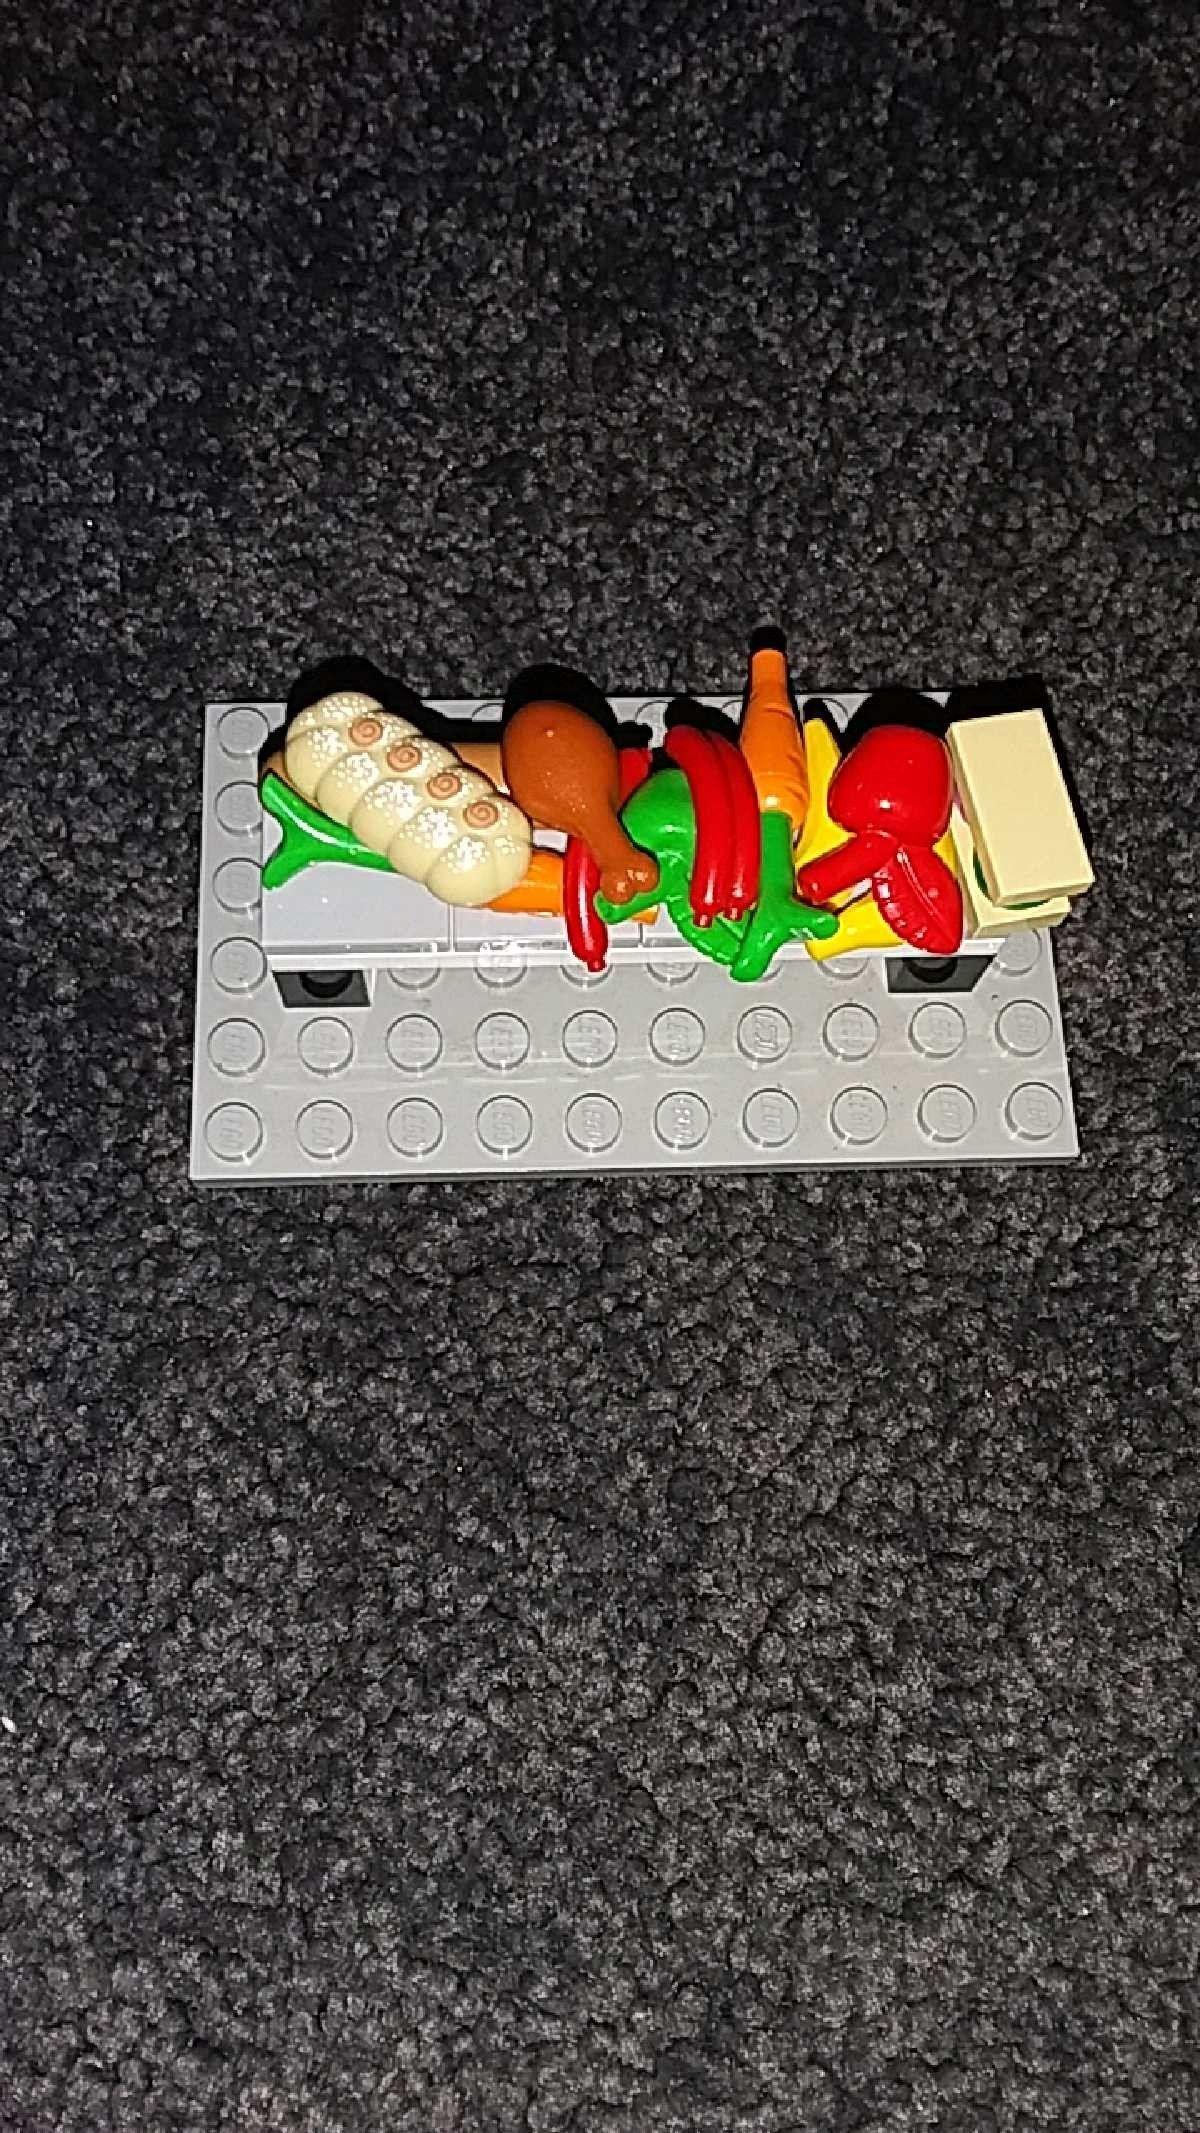 Pin By Popi On Lego